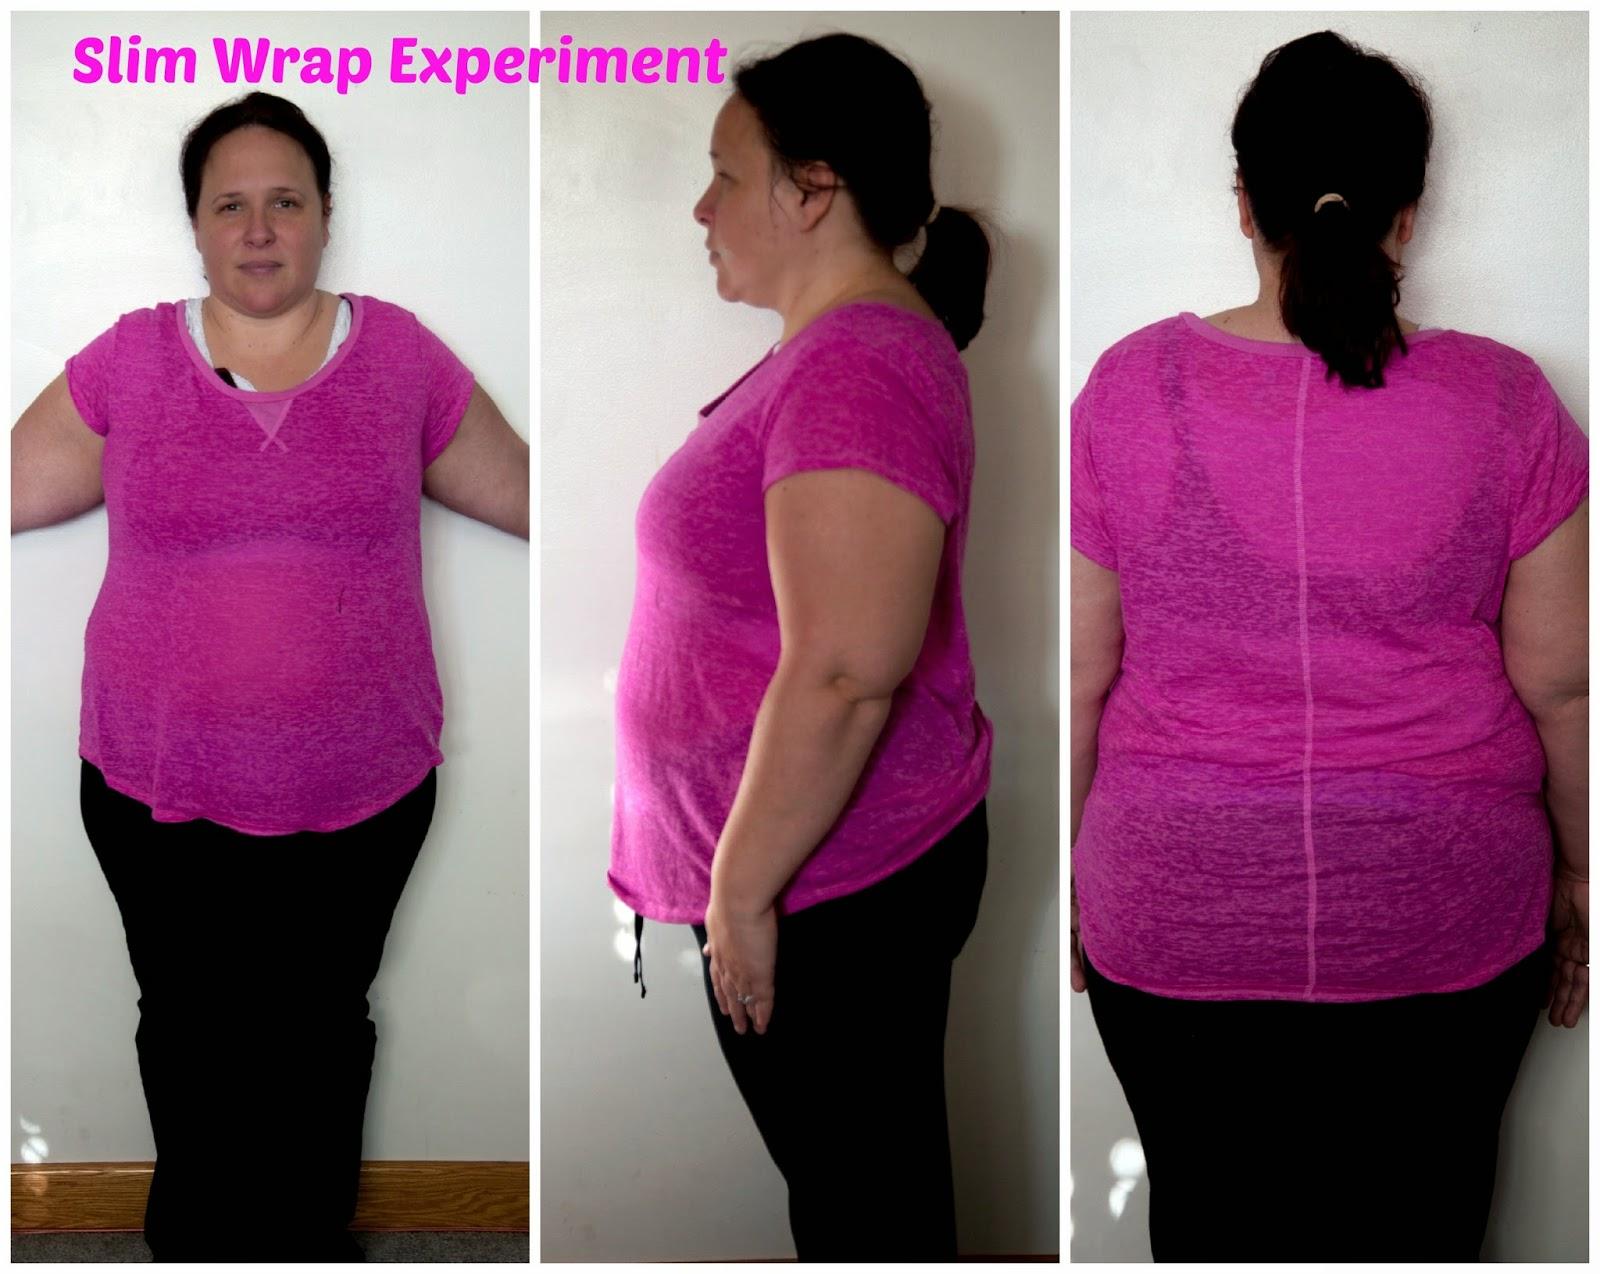 Rockin Body Weight Loss MOBU Herbals Slim Wrap